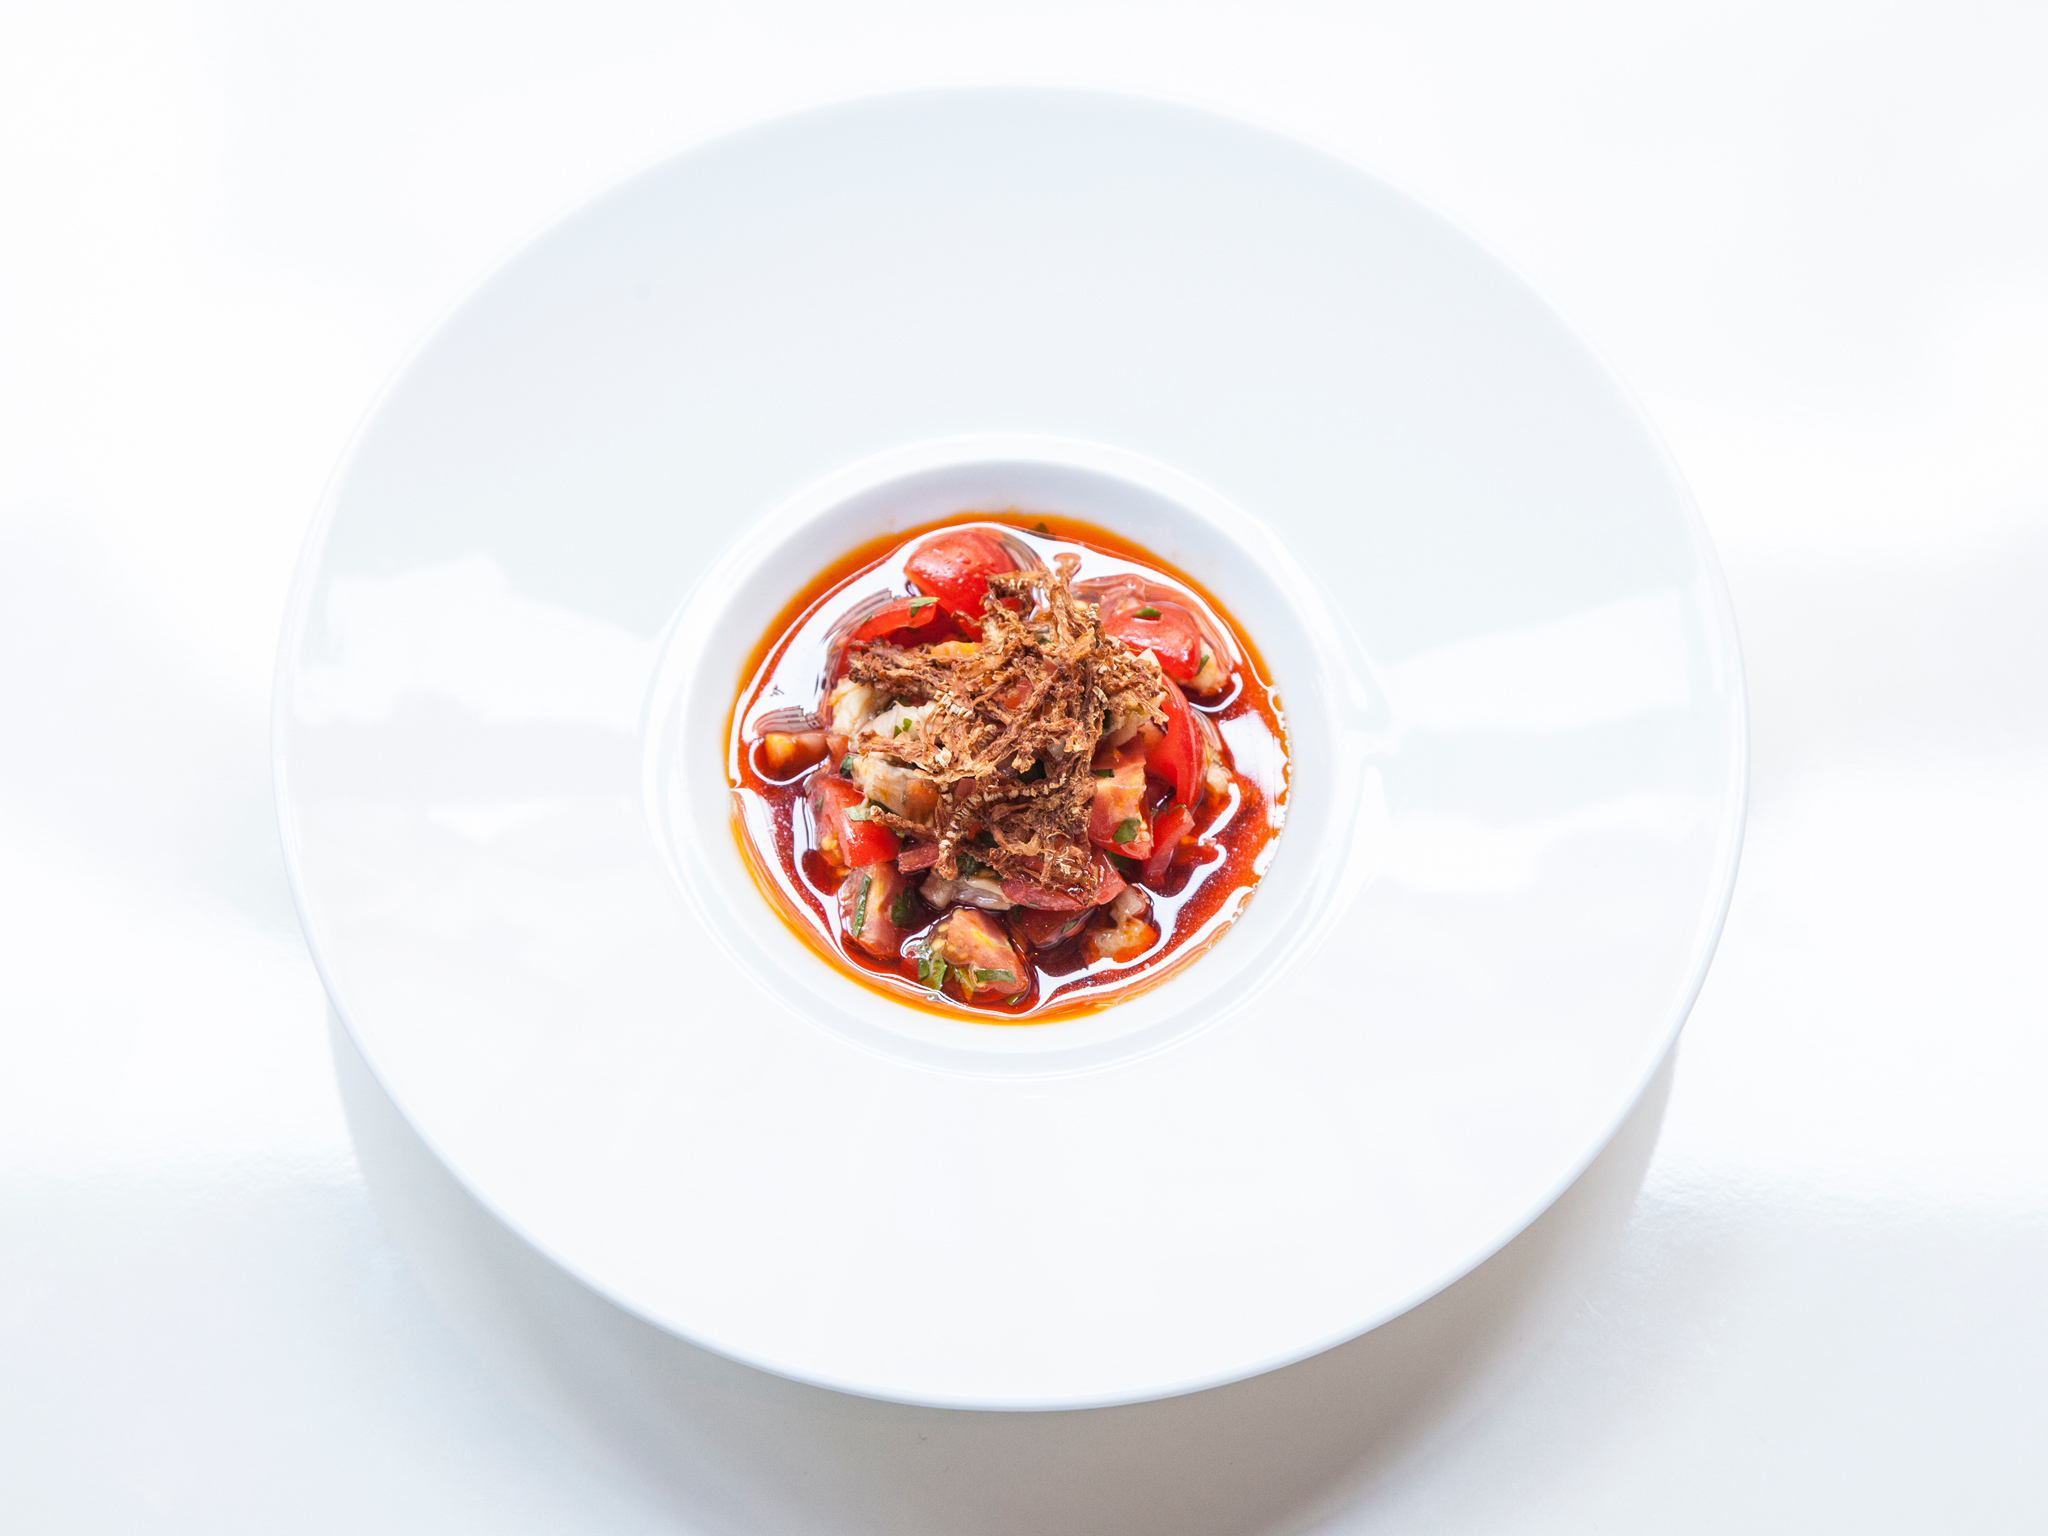 Tomato and smoked eel at Xu